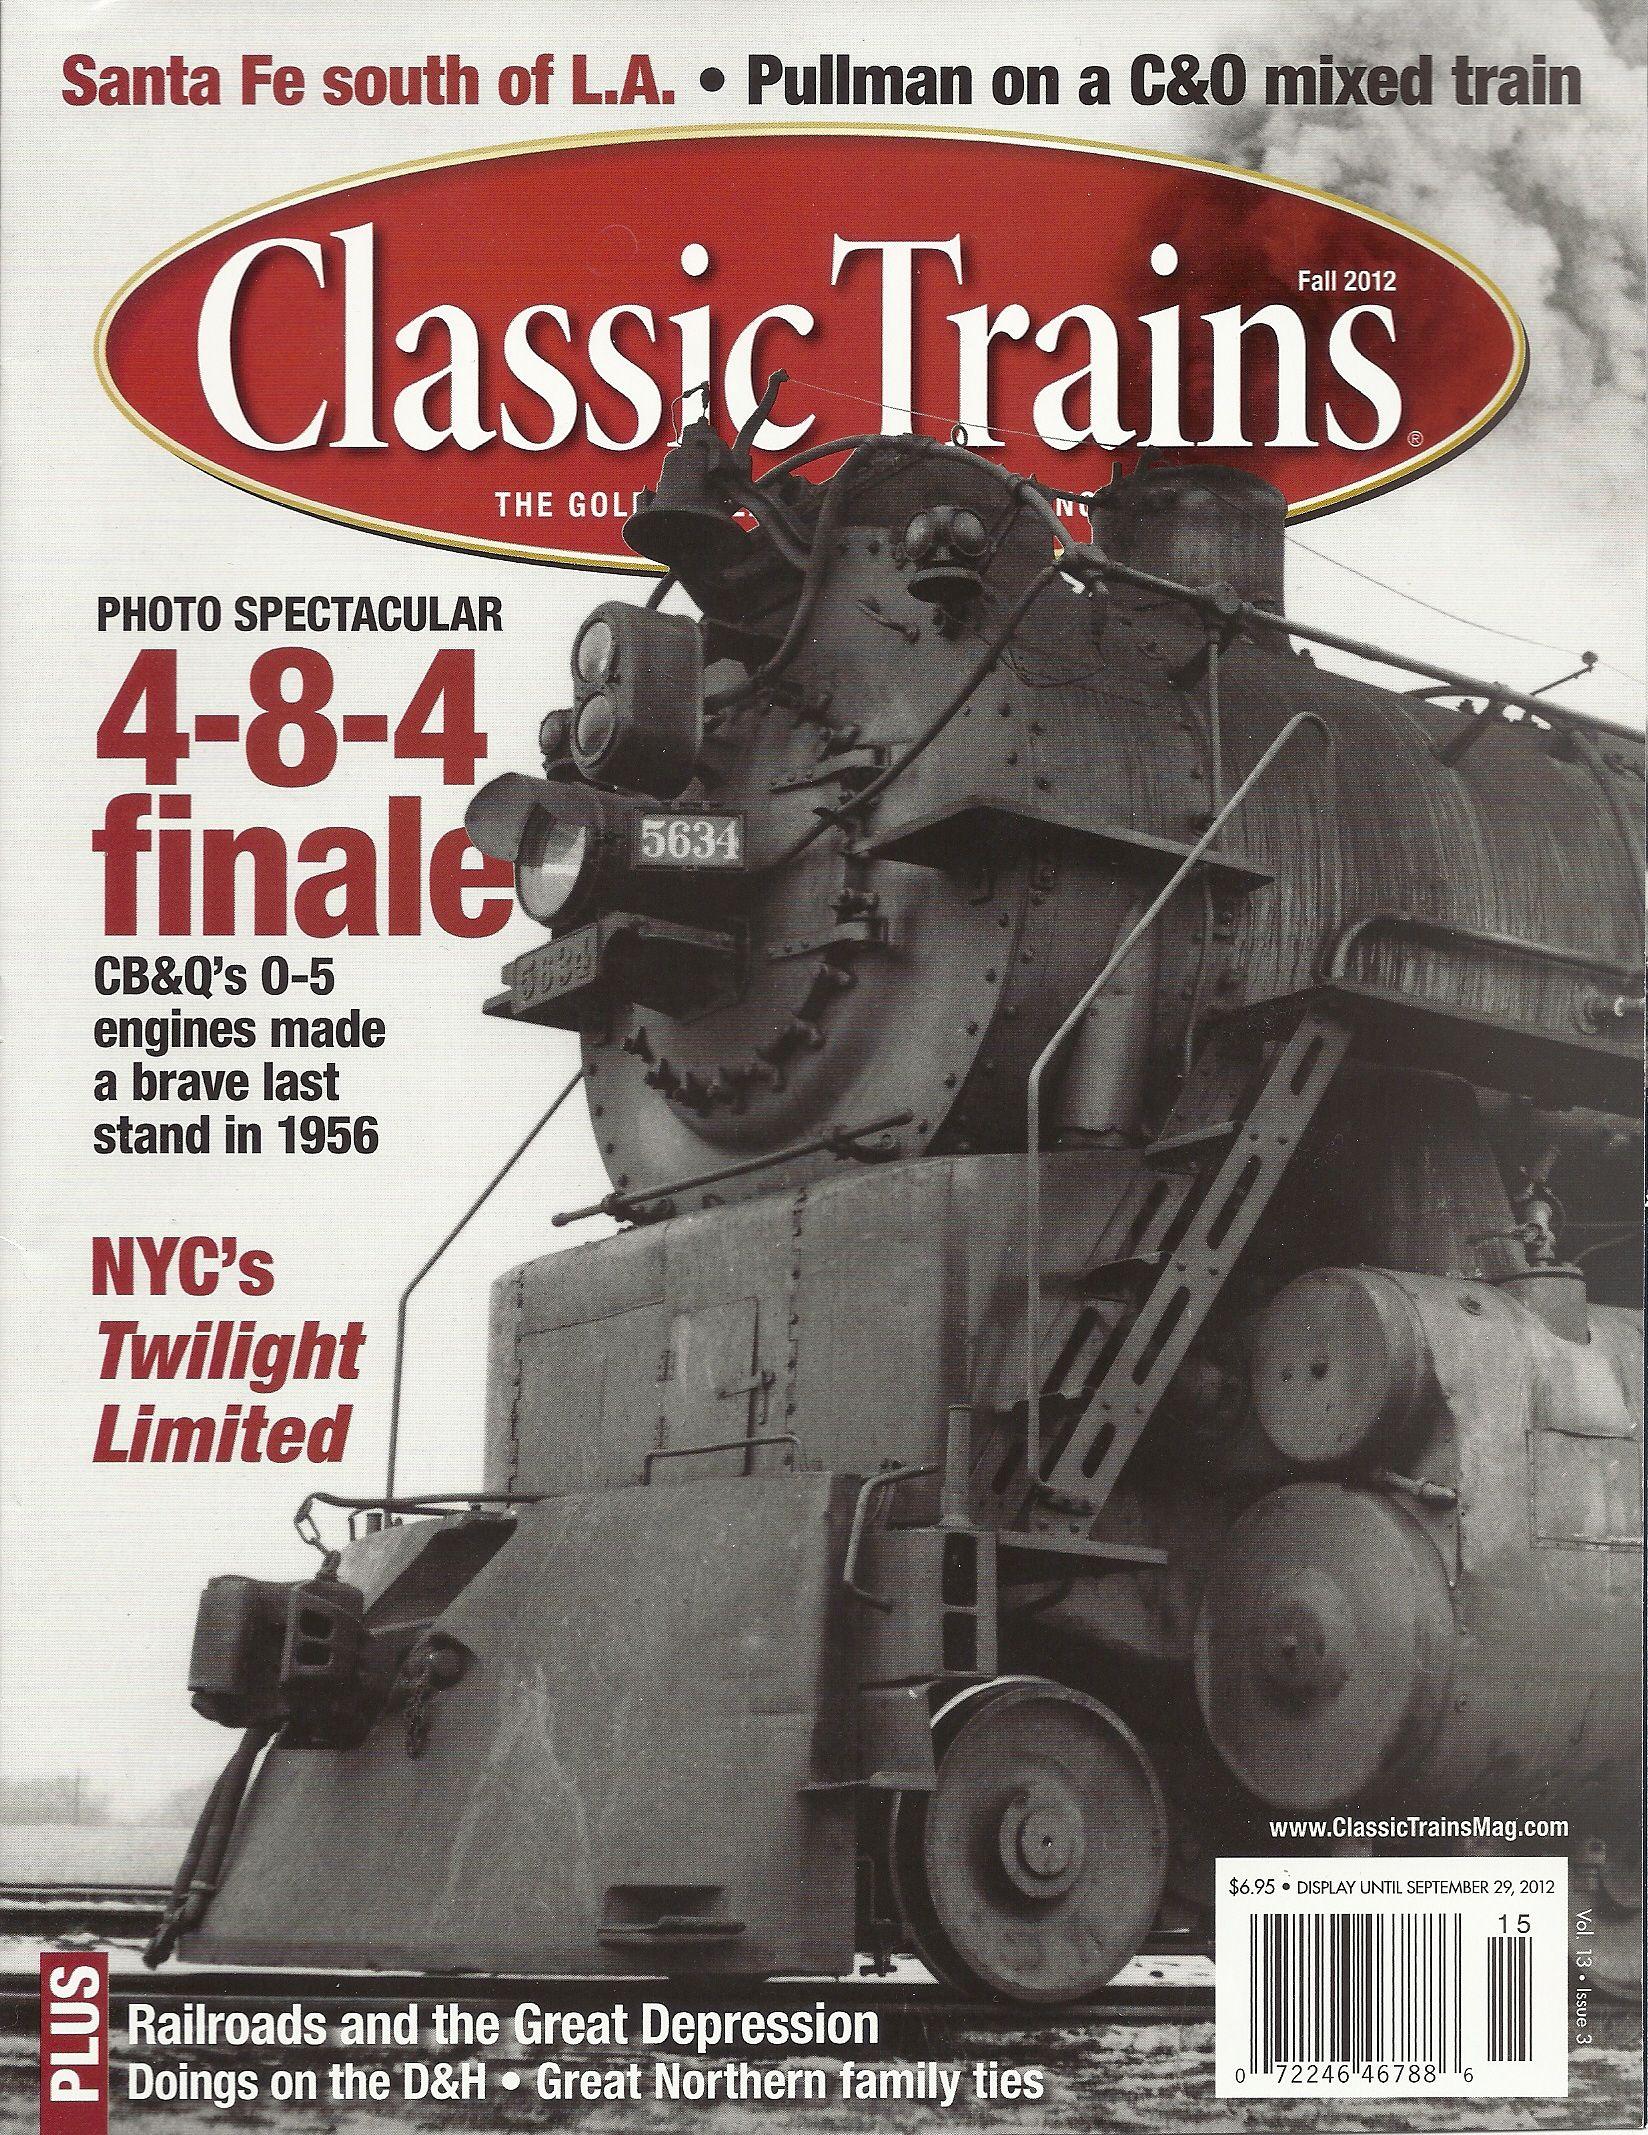 Classic Trains, Fall 2012